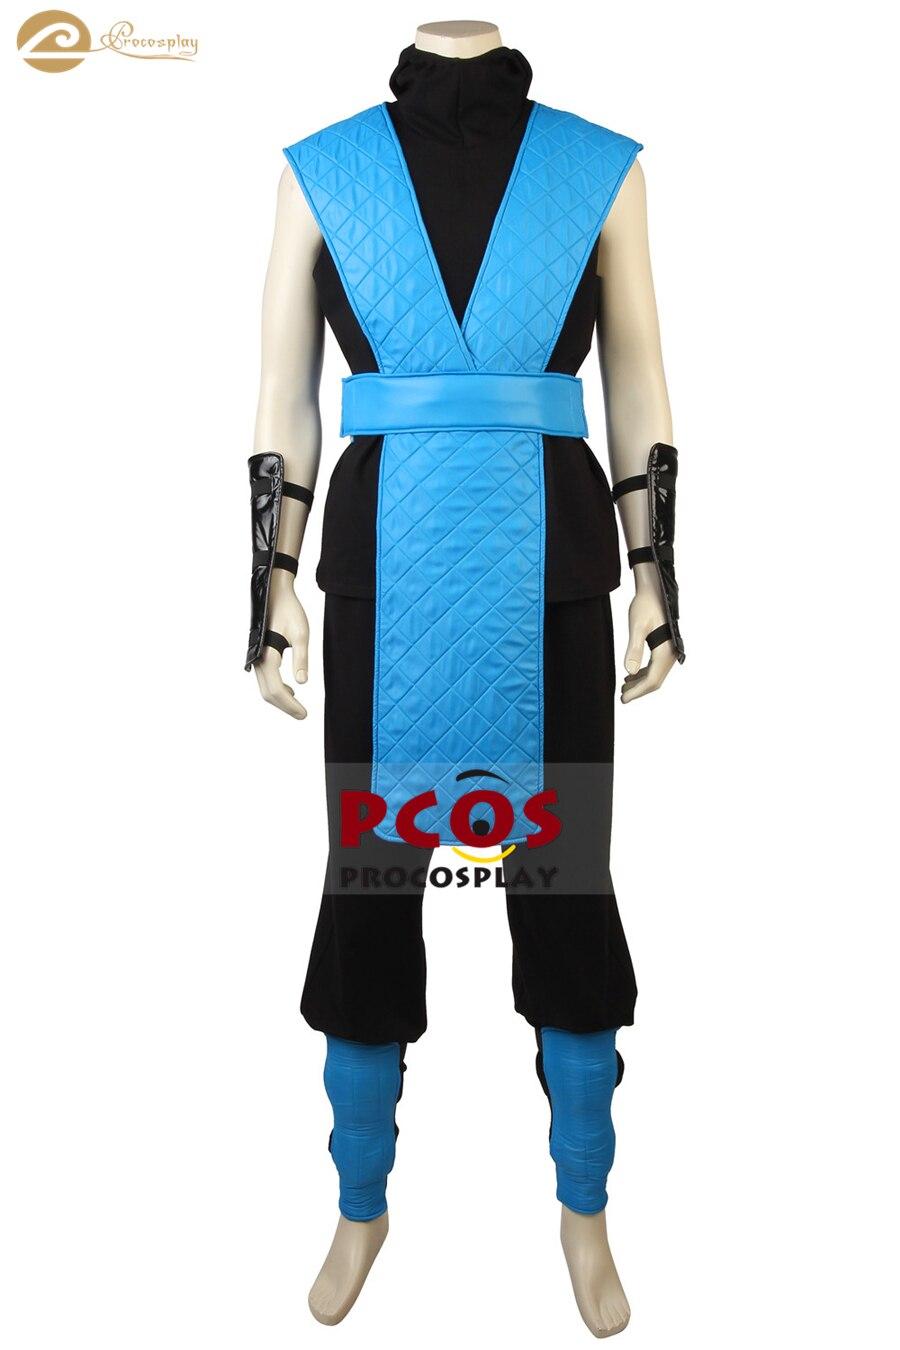 Procosplay mortal kombat x sub-zero cosplay traje para mulher mp005161